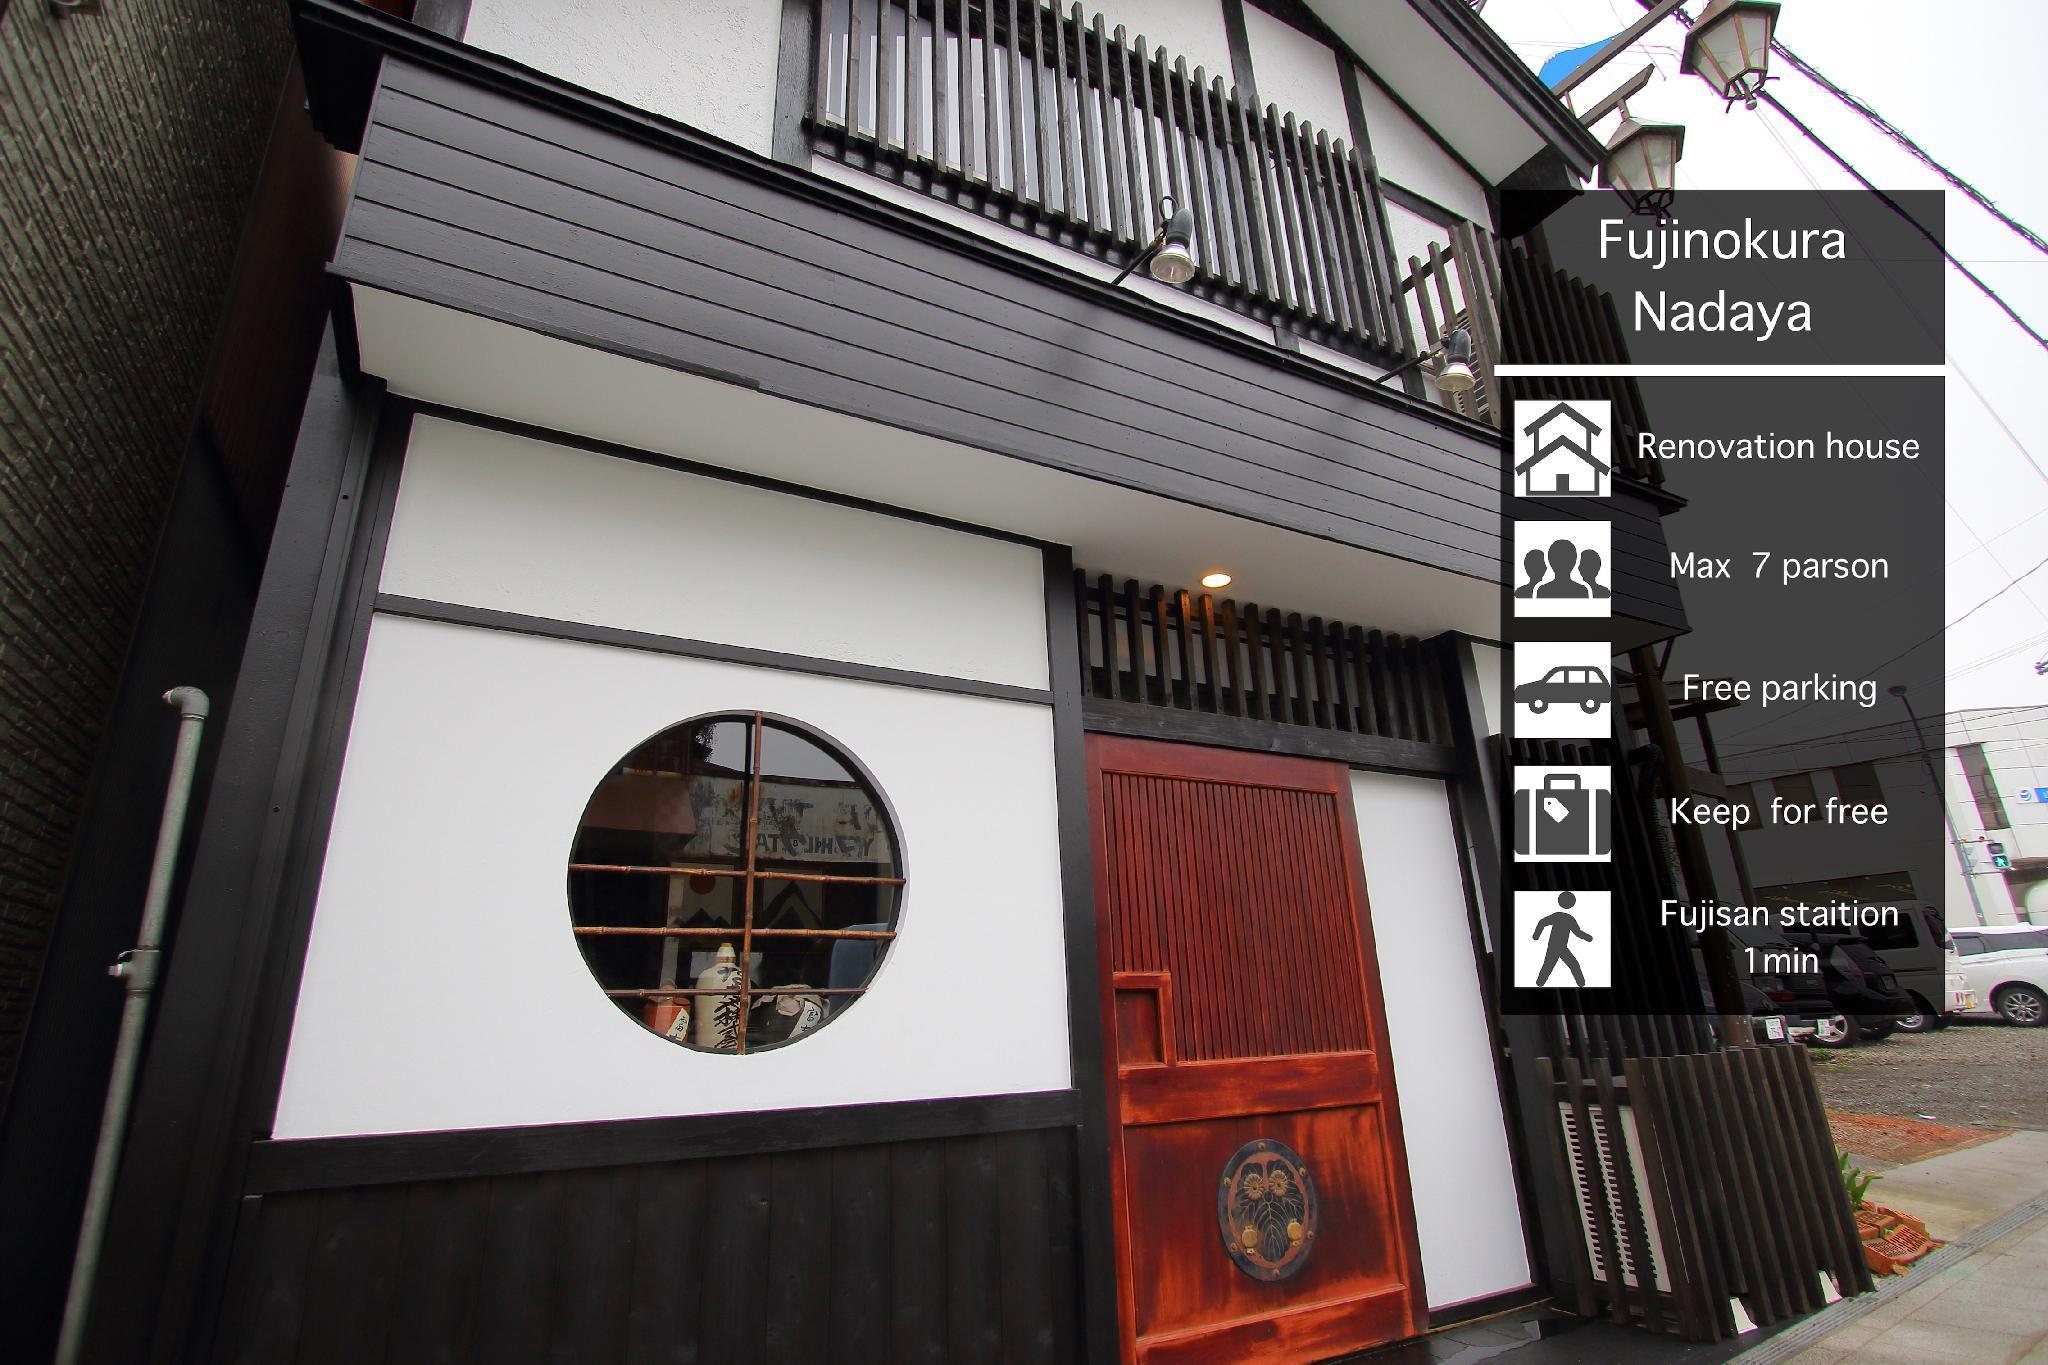 Fujinokura nadaya